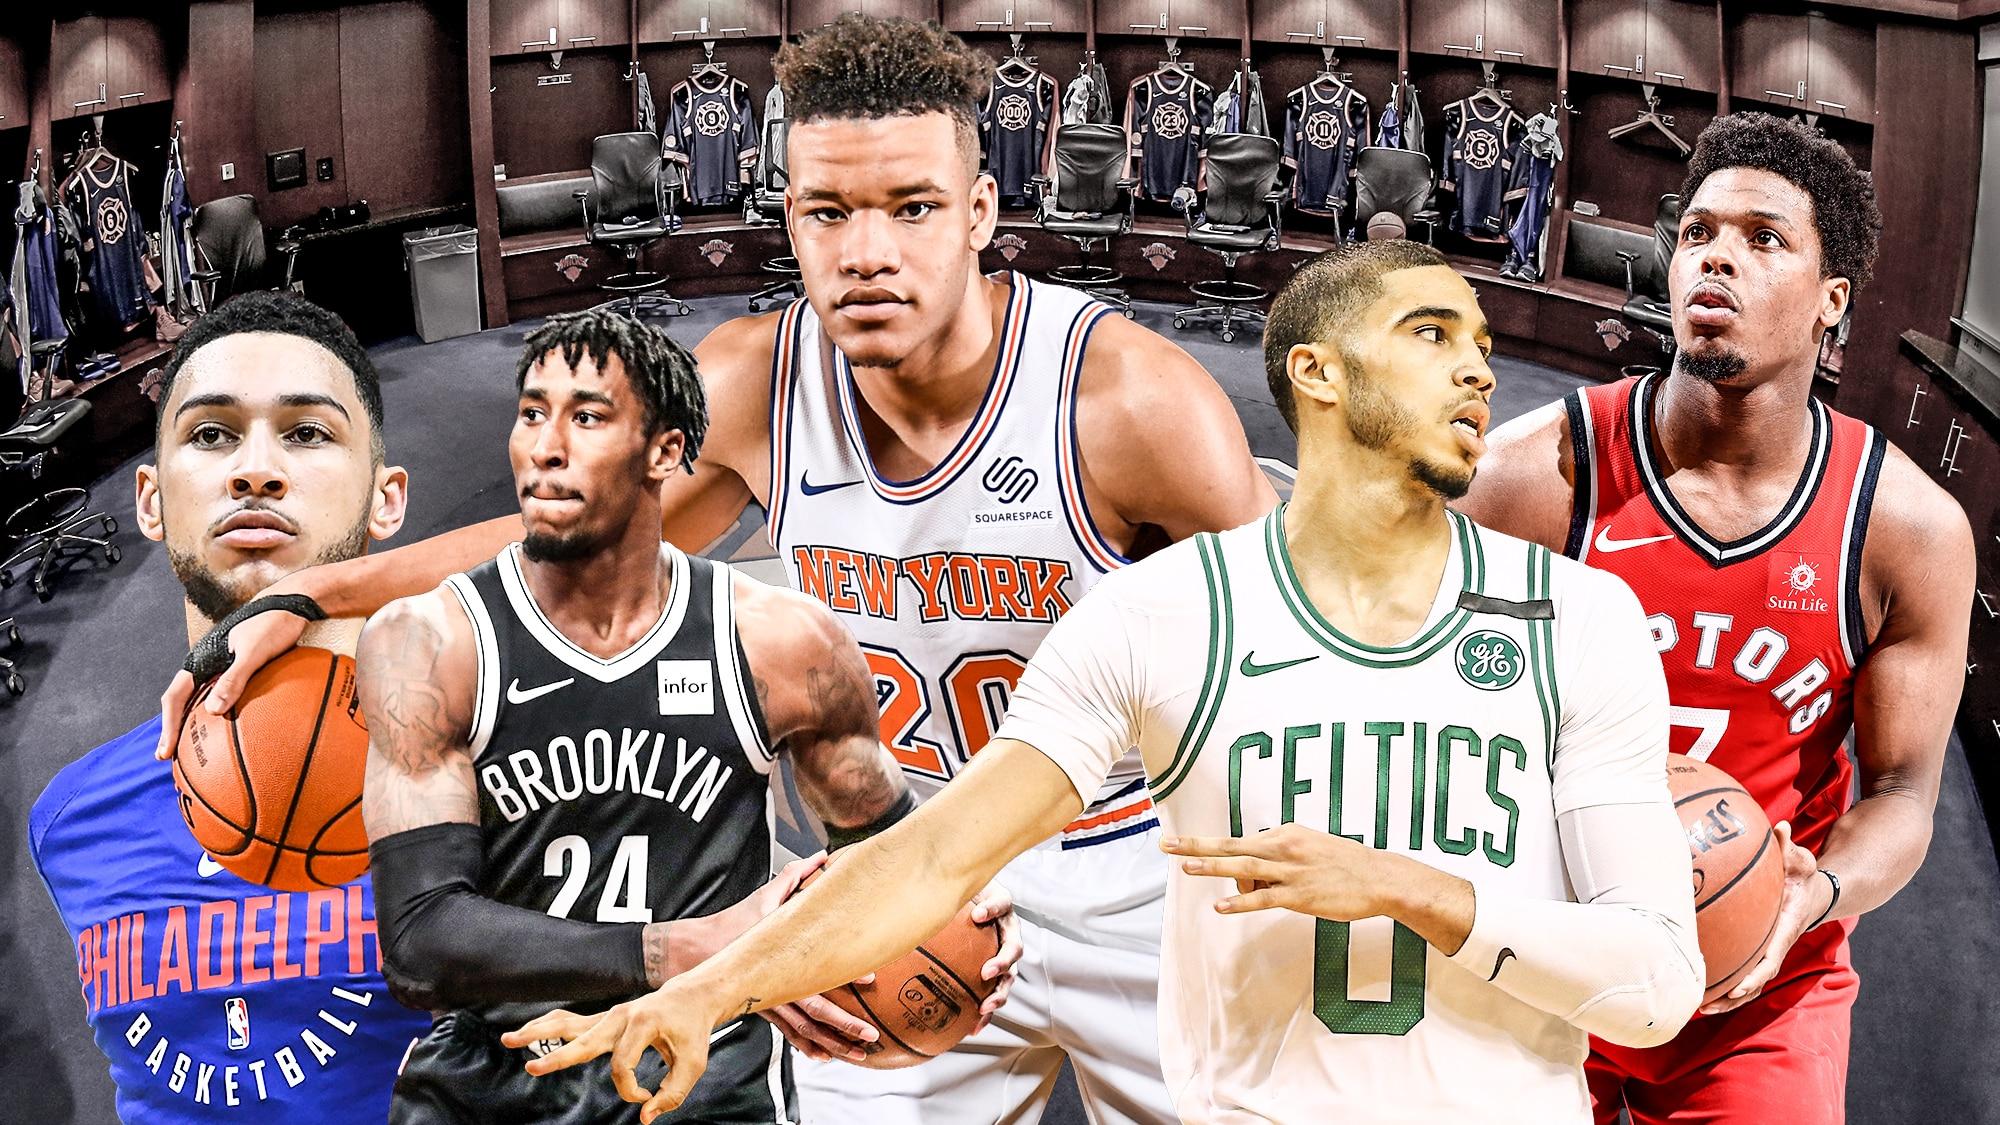 d0e27edc0c44 New York Knicks